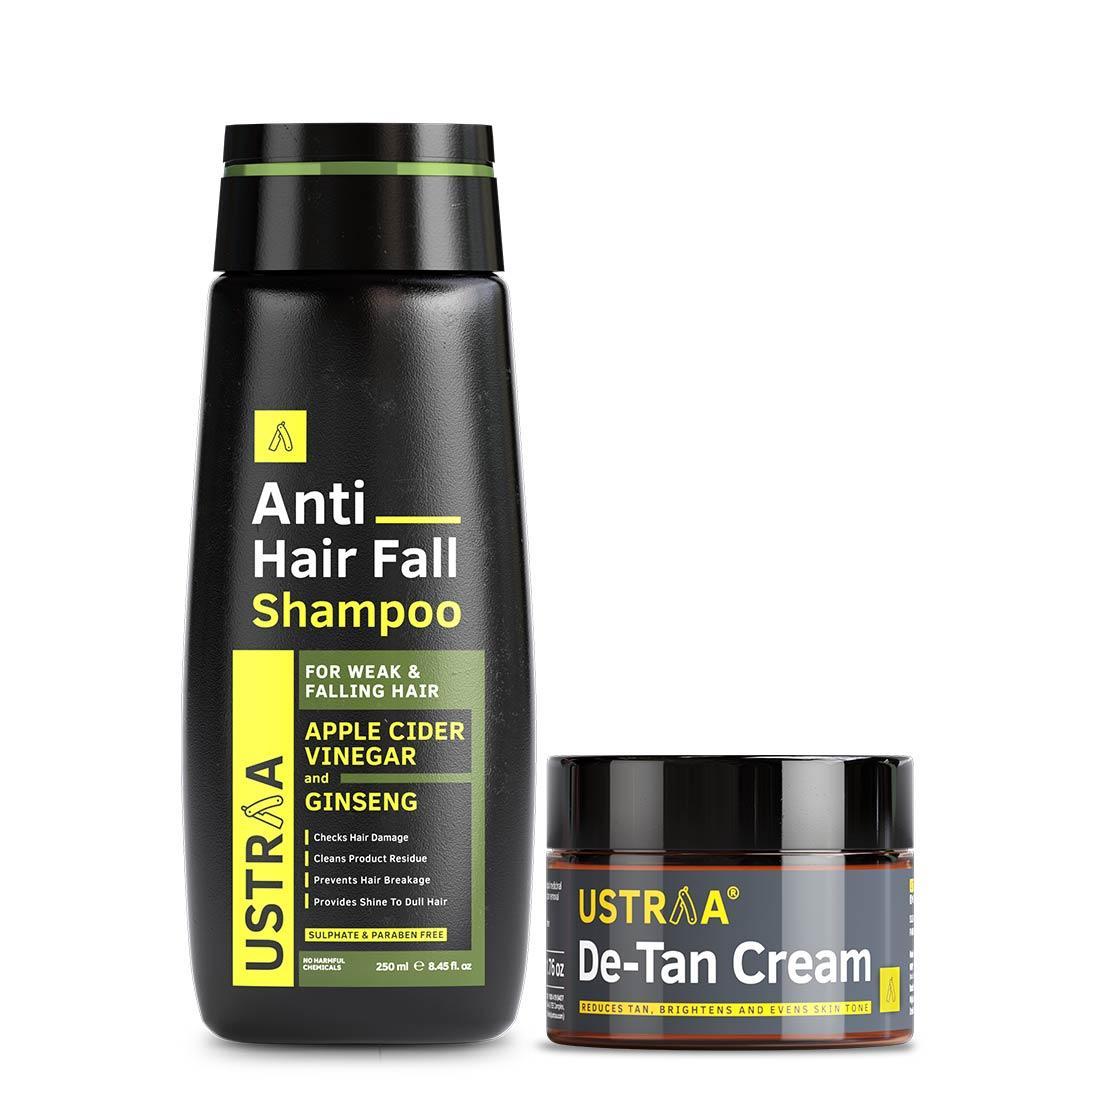 De-Tan Cream for Men and Anti-Hairfall Shampoo